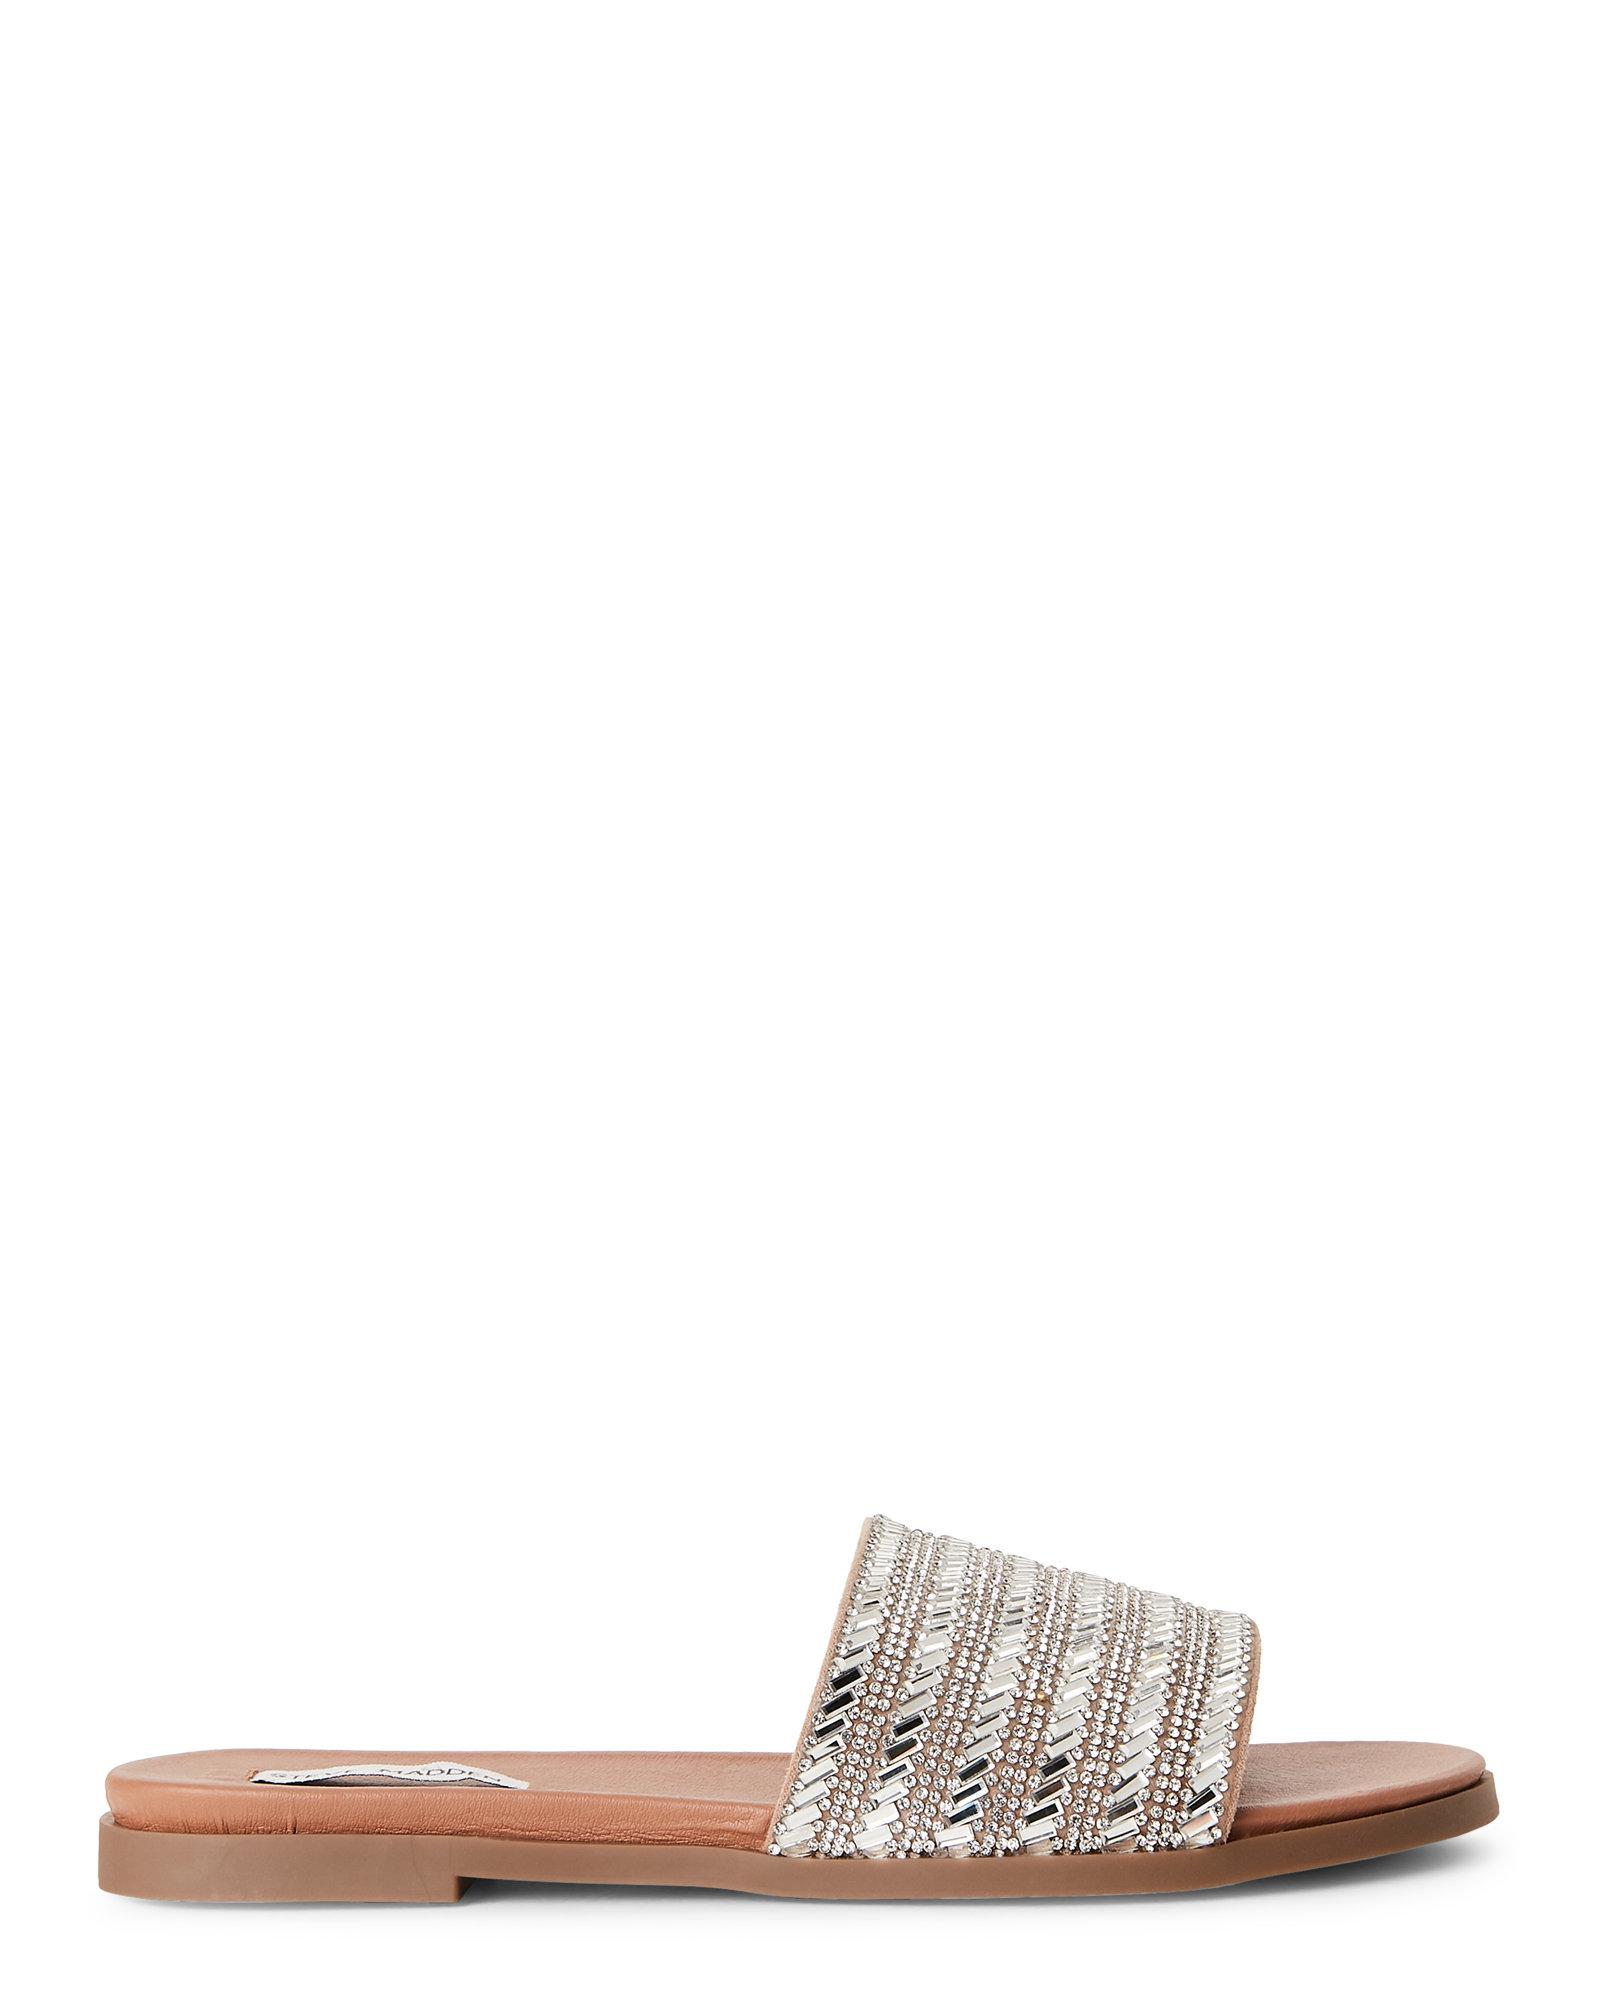 1fc315a2576 Lyst - Steve Madden Silver Karot Rhinestone Slide Sandals in Metallic